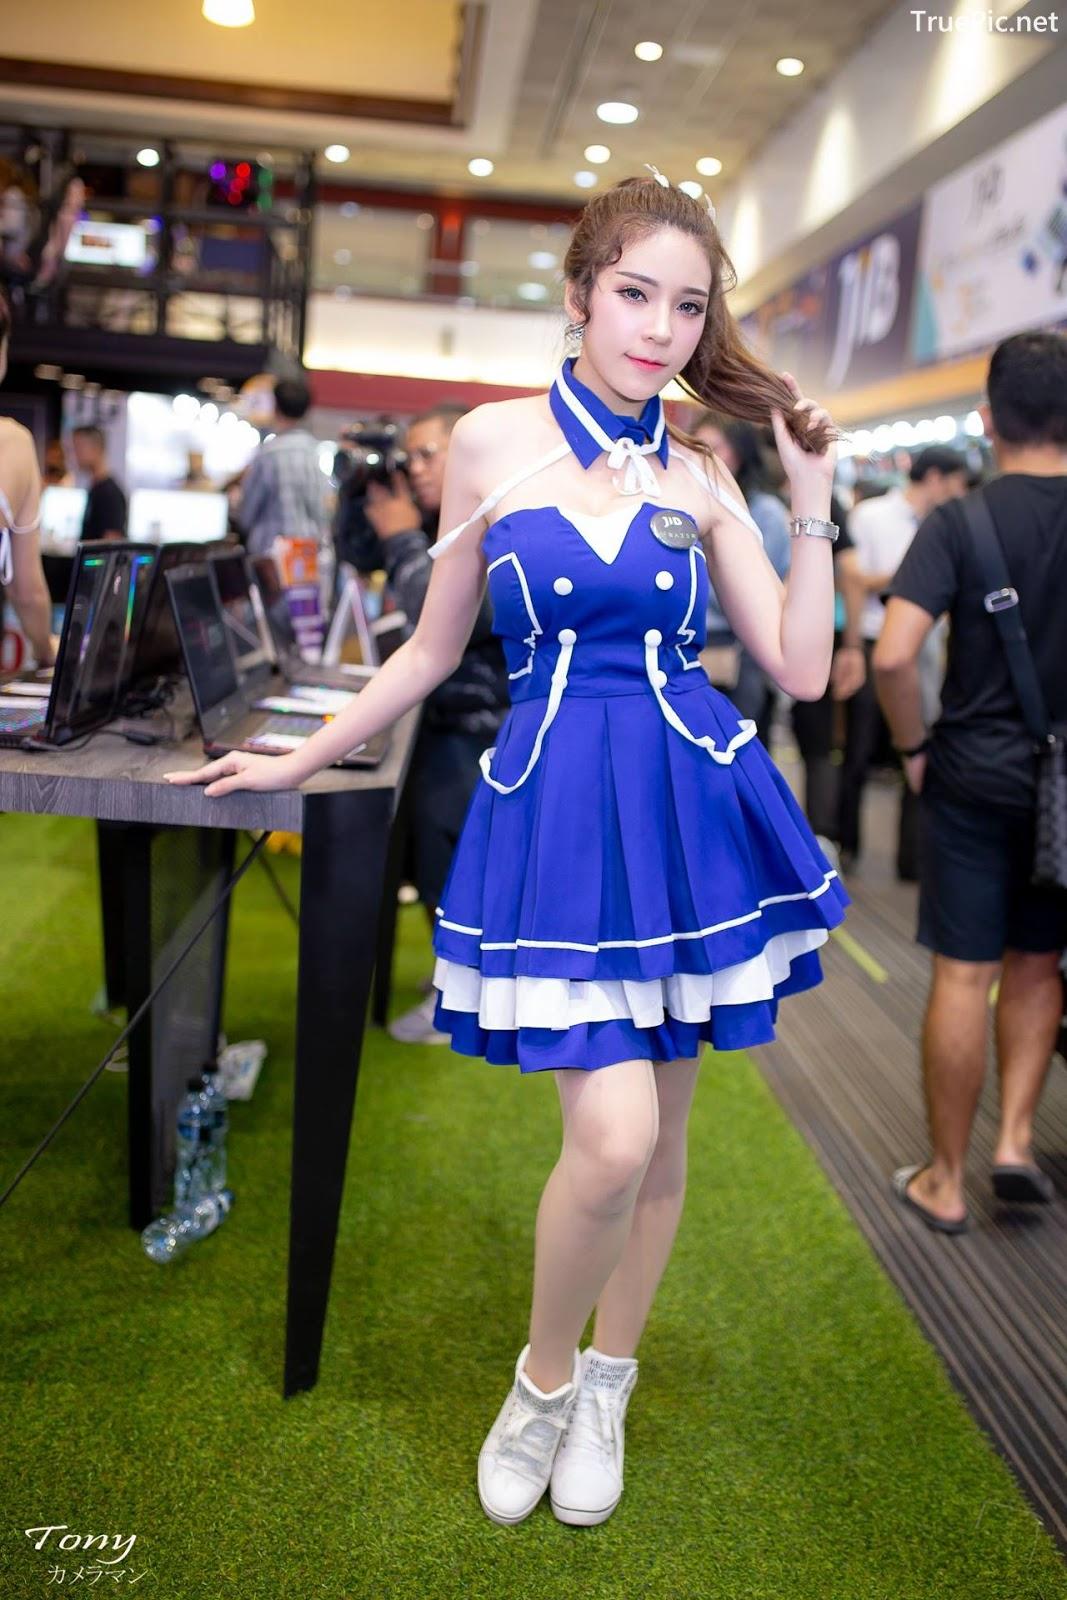 Image-Thailand-Hot-Model-Thai-PG-At-Commart-2018-TruePic.net- Picture-12